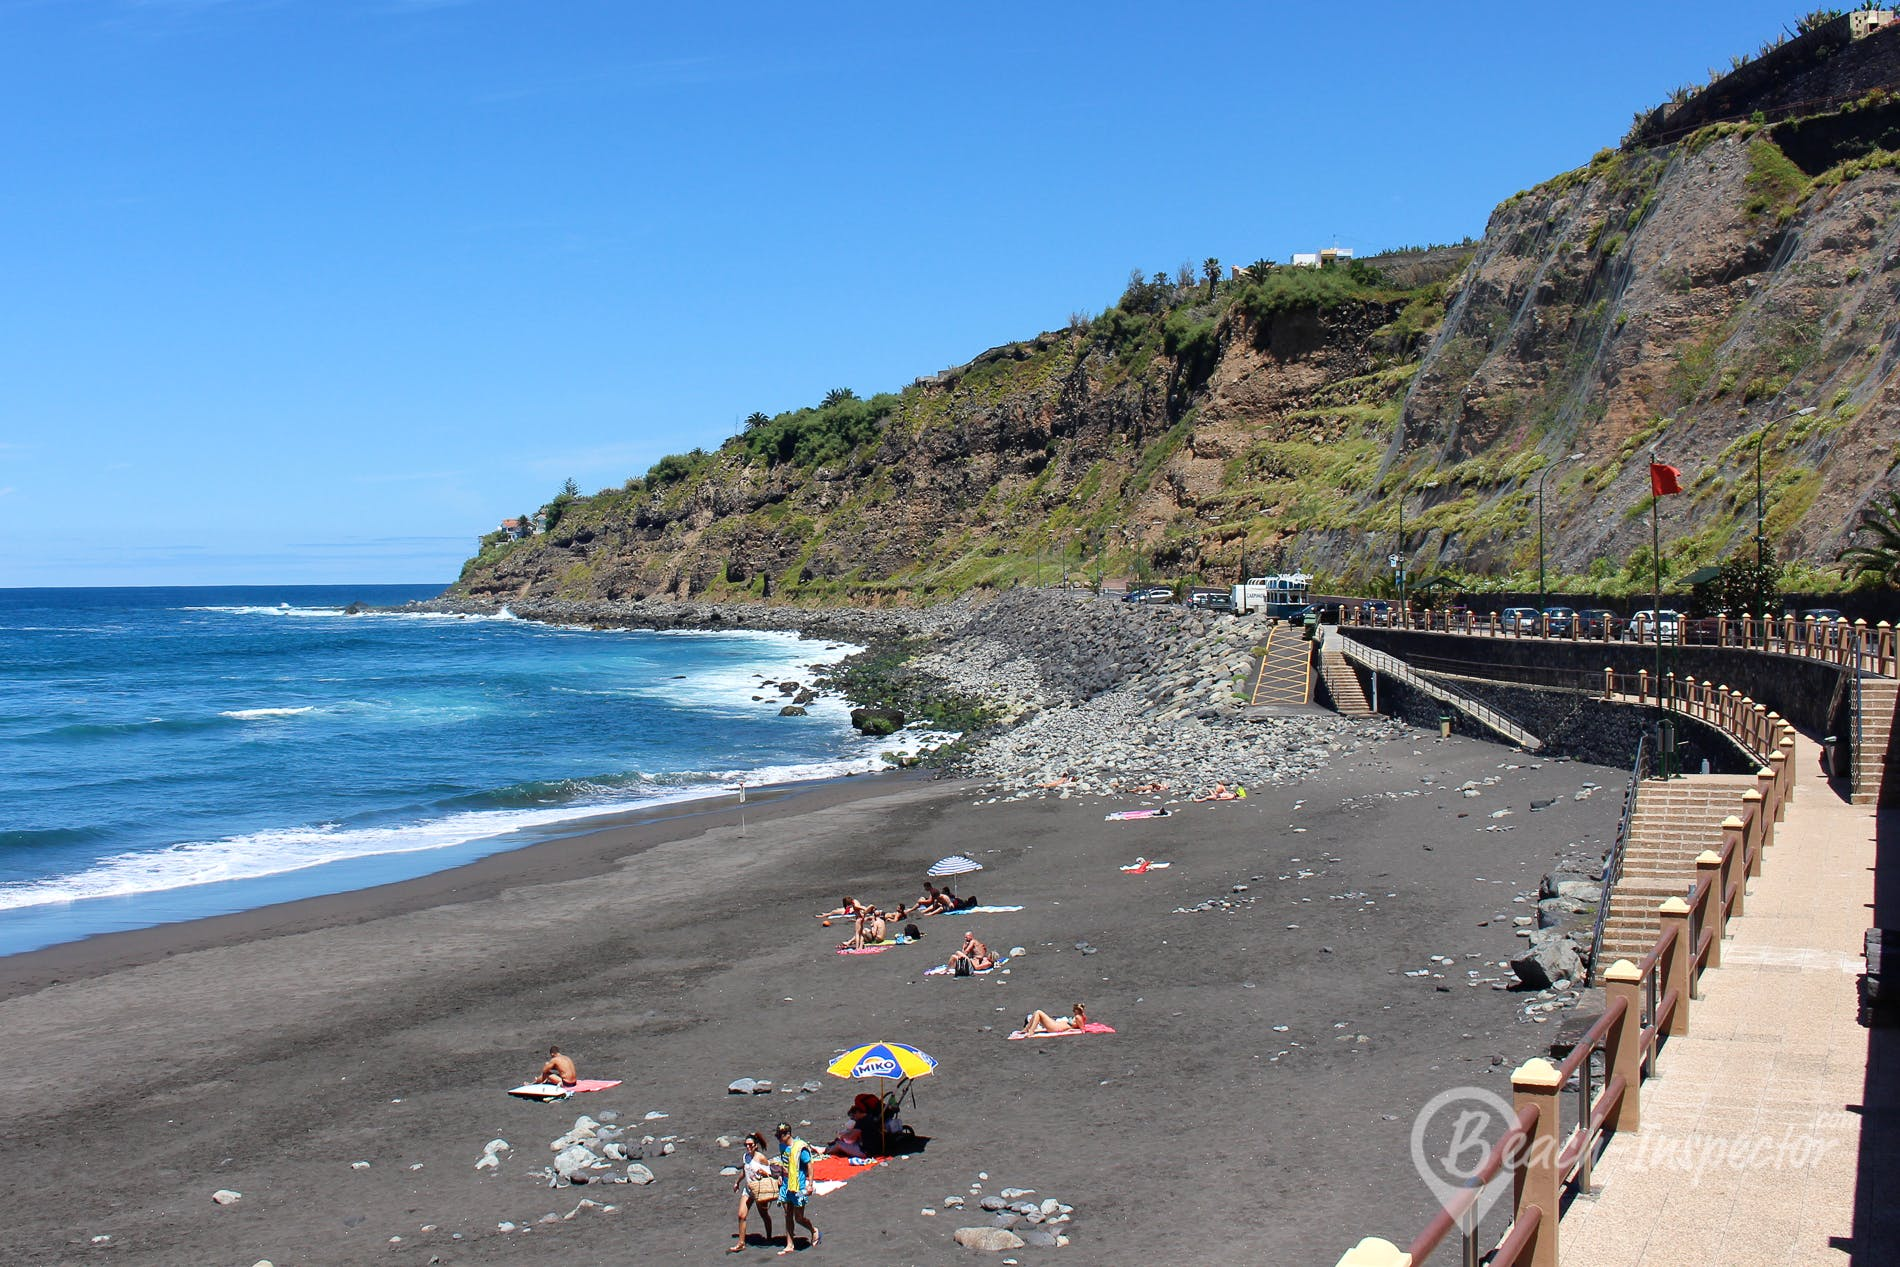 Beach Playa del Socorro, Tenerife, Spain